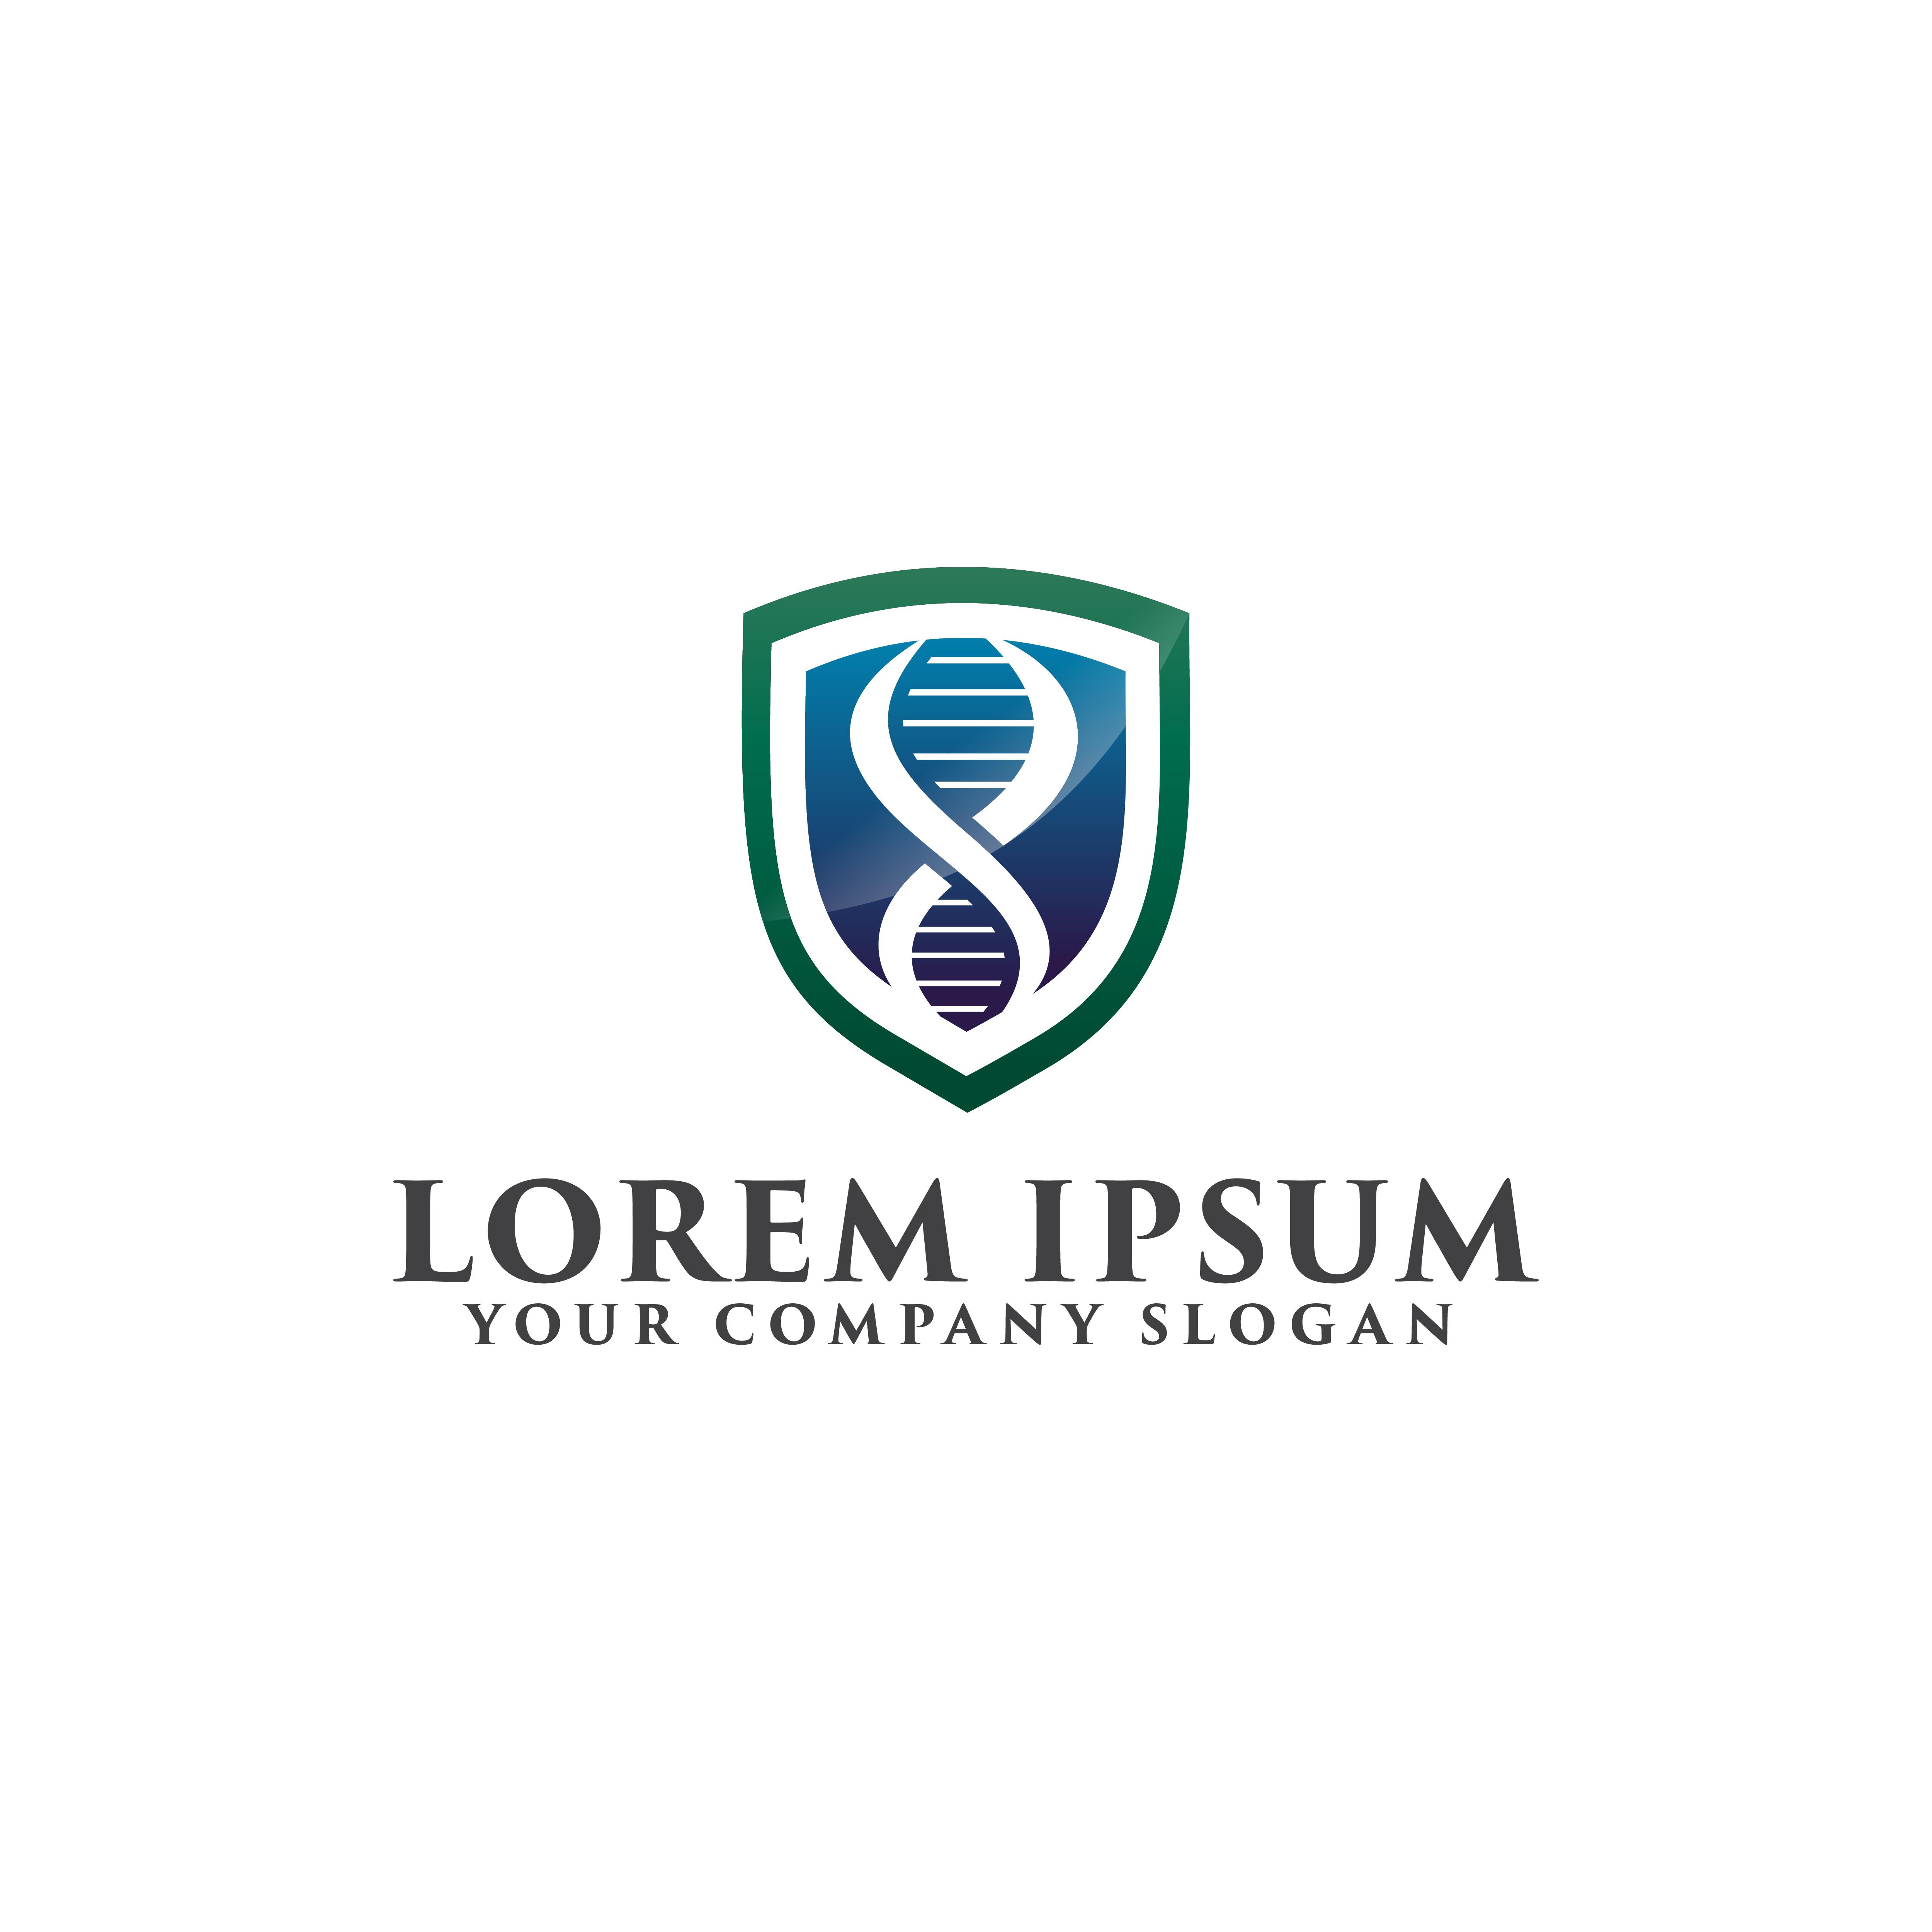 Medical Shield Logo  Genetic Logo Design Concept Template